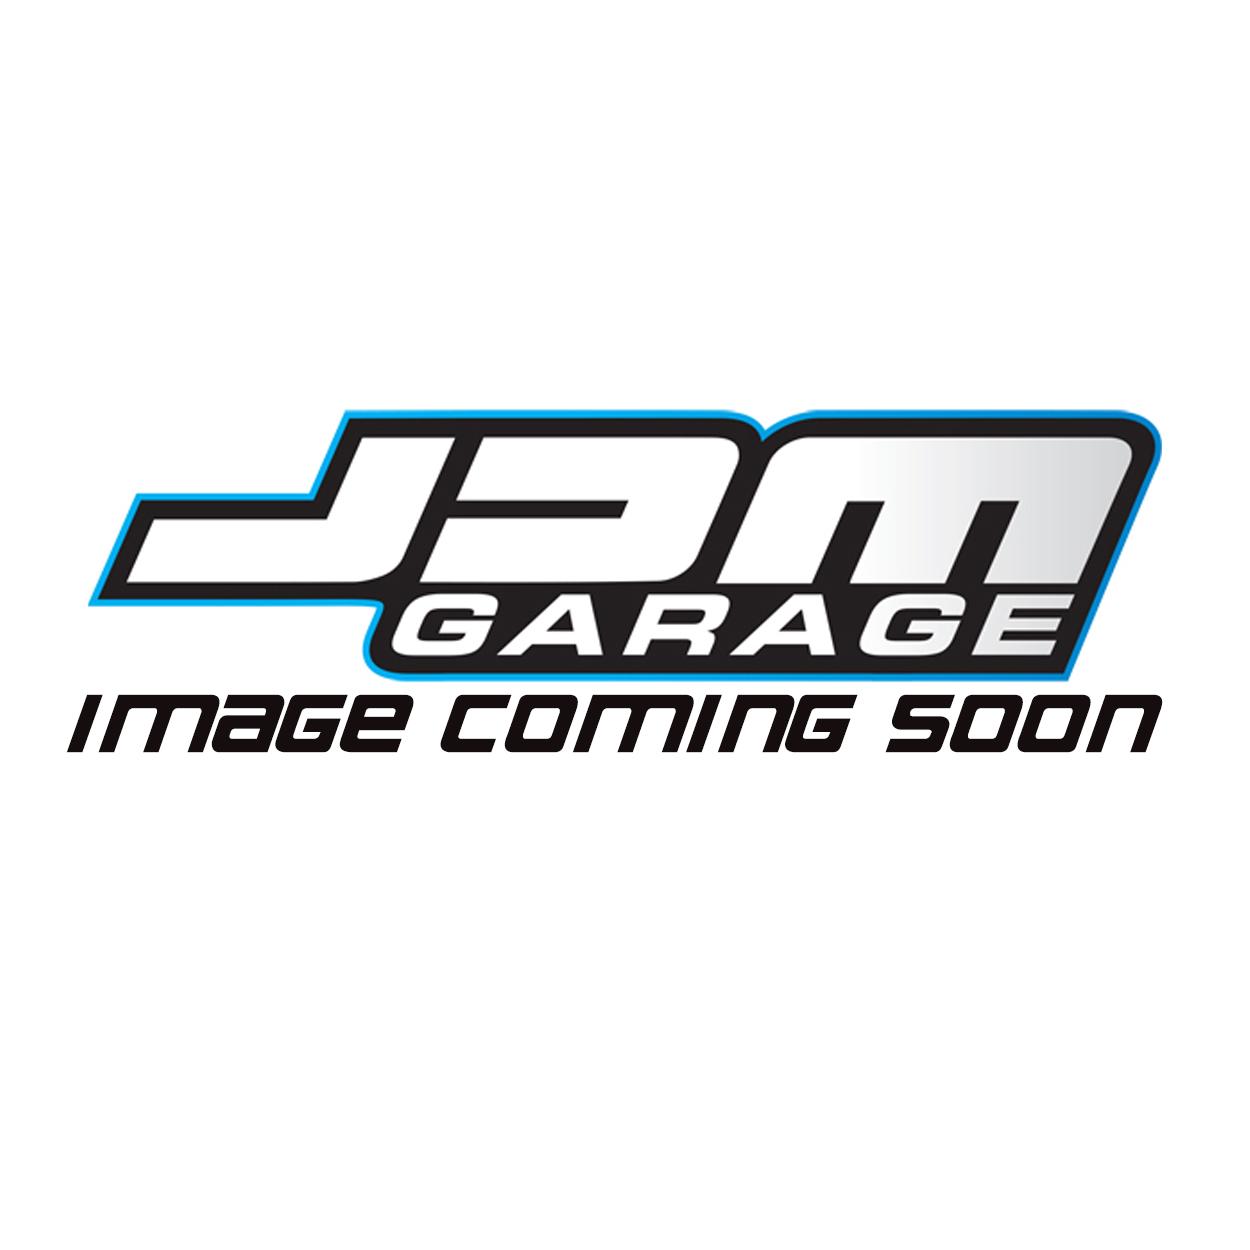 Genuine Nismo Uprated Heavy Duty Clutch Pivot Pin Ball For Nissan Skyline R31 R32 GTS-T Cefiro A31 RB20DET RB25DET Silvia S13 S14 S15 SR20DET 30537-RS540